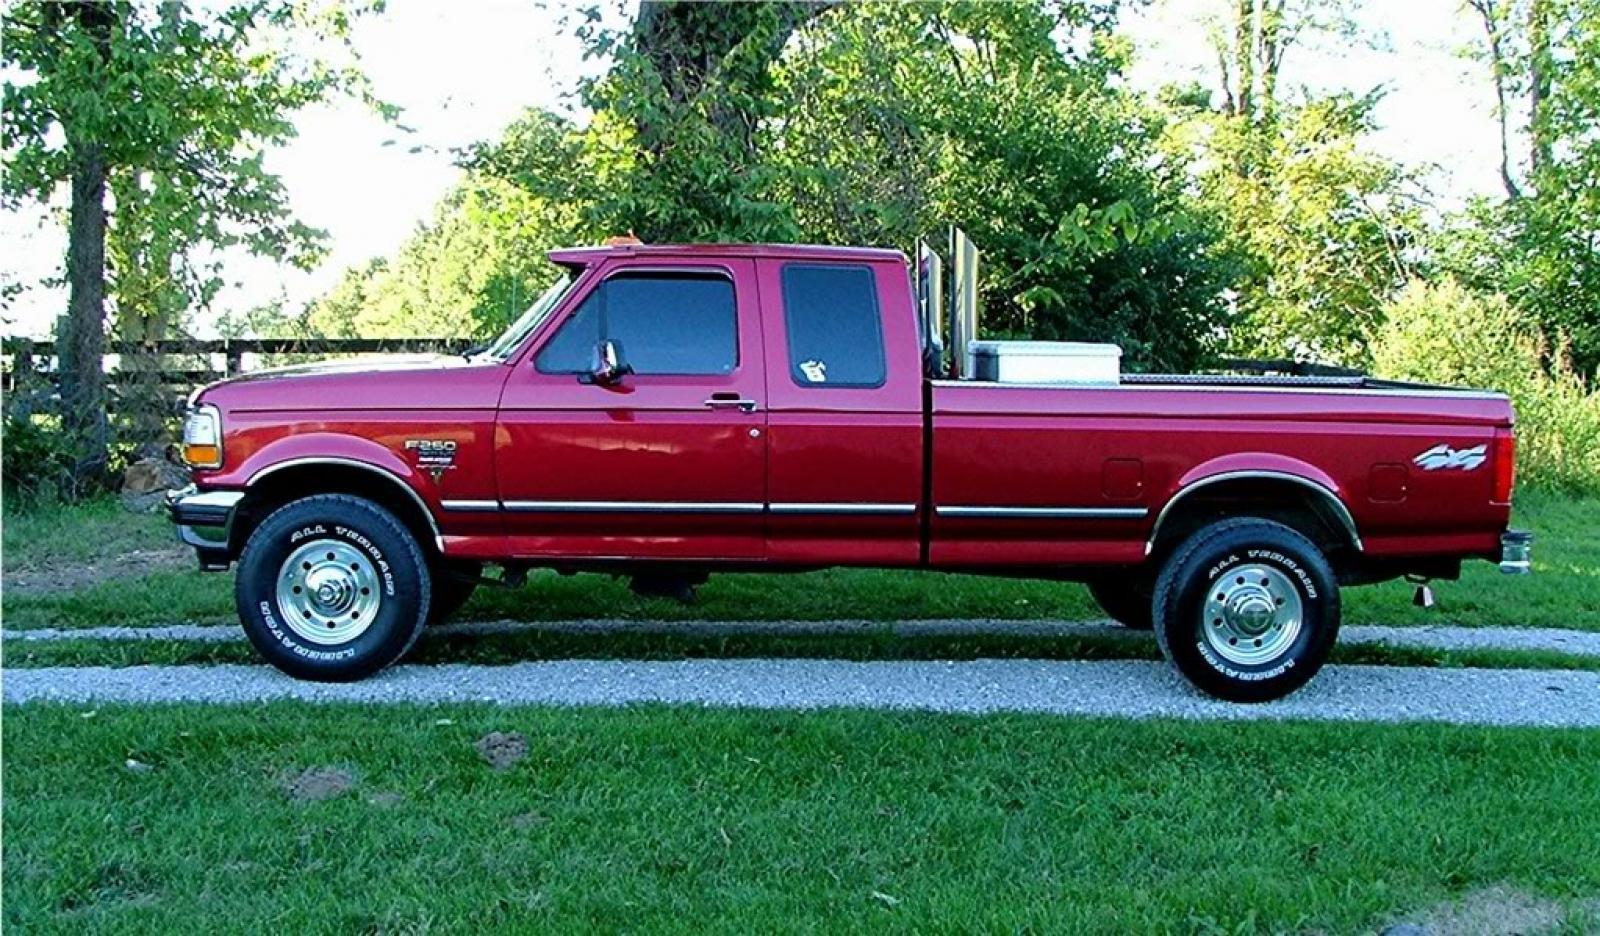 800 1024 1280 1600 origin 1997 ford f 250